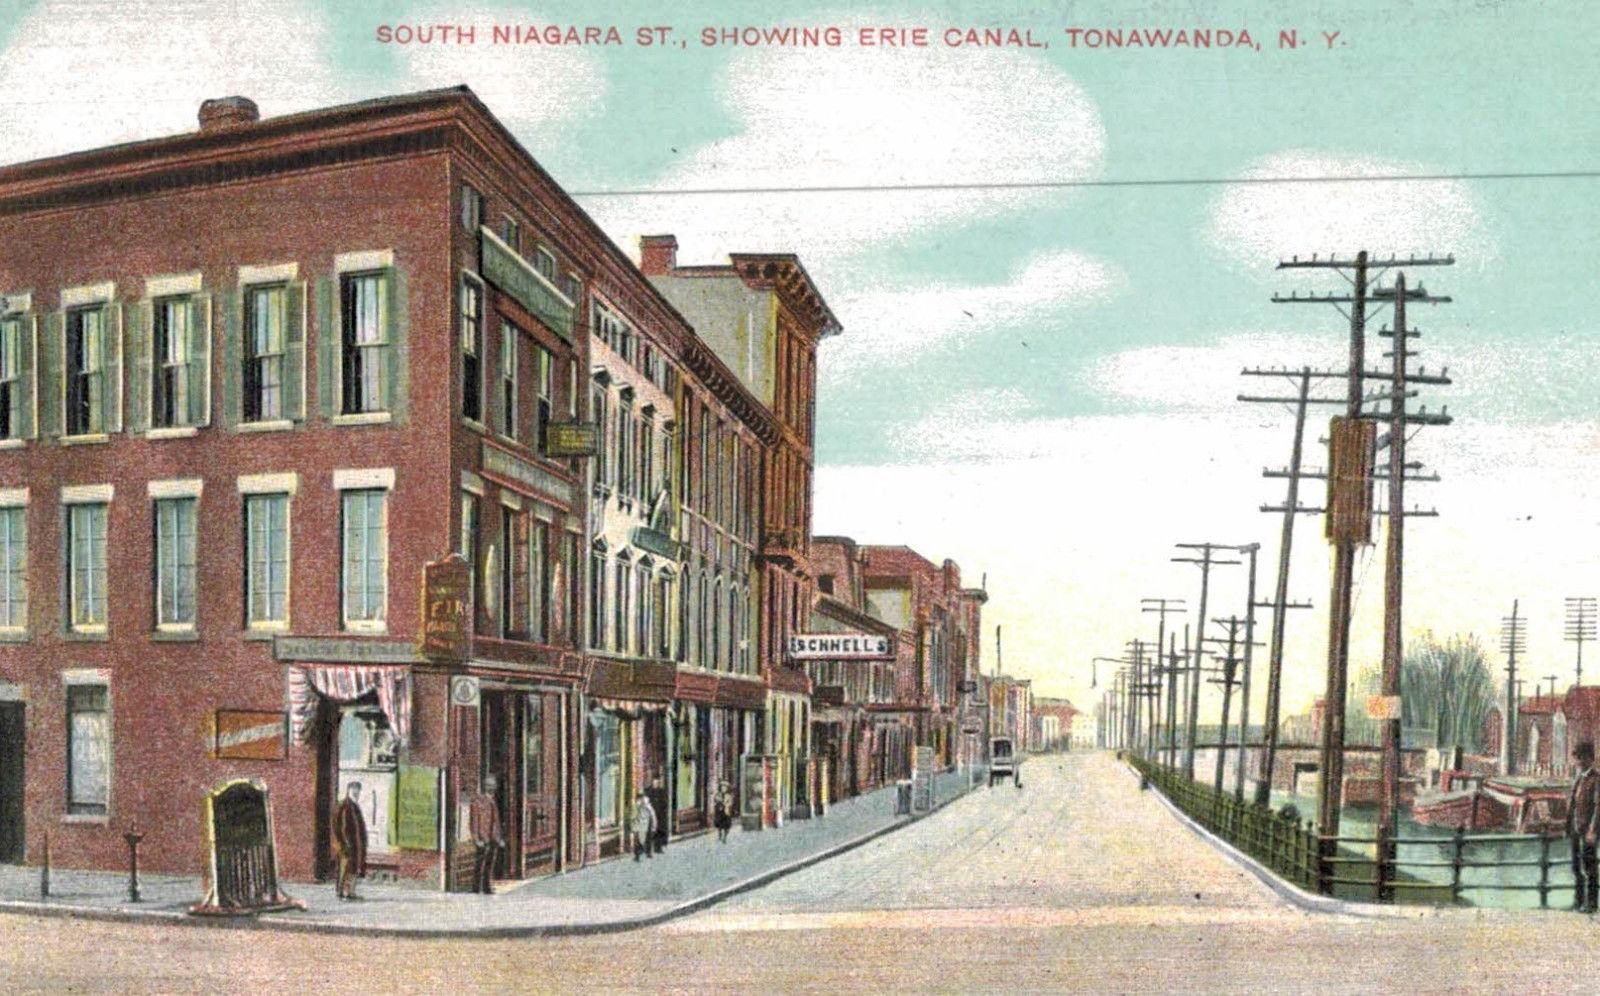 South Niagara Street, showing Erie Canal, postcard (1909).jpg